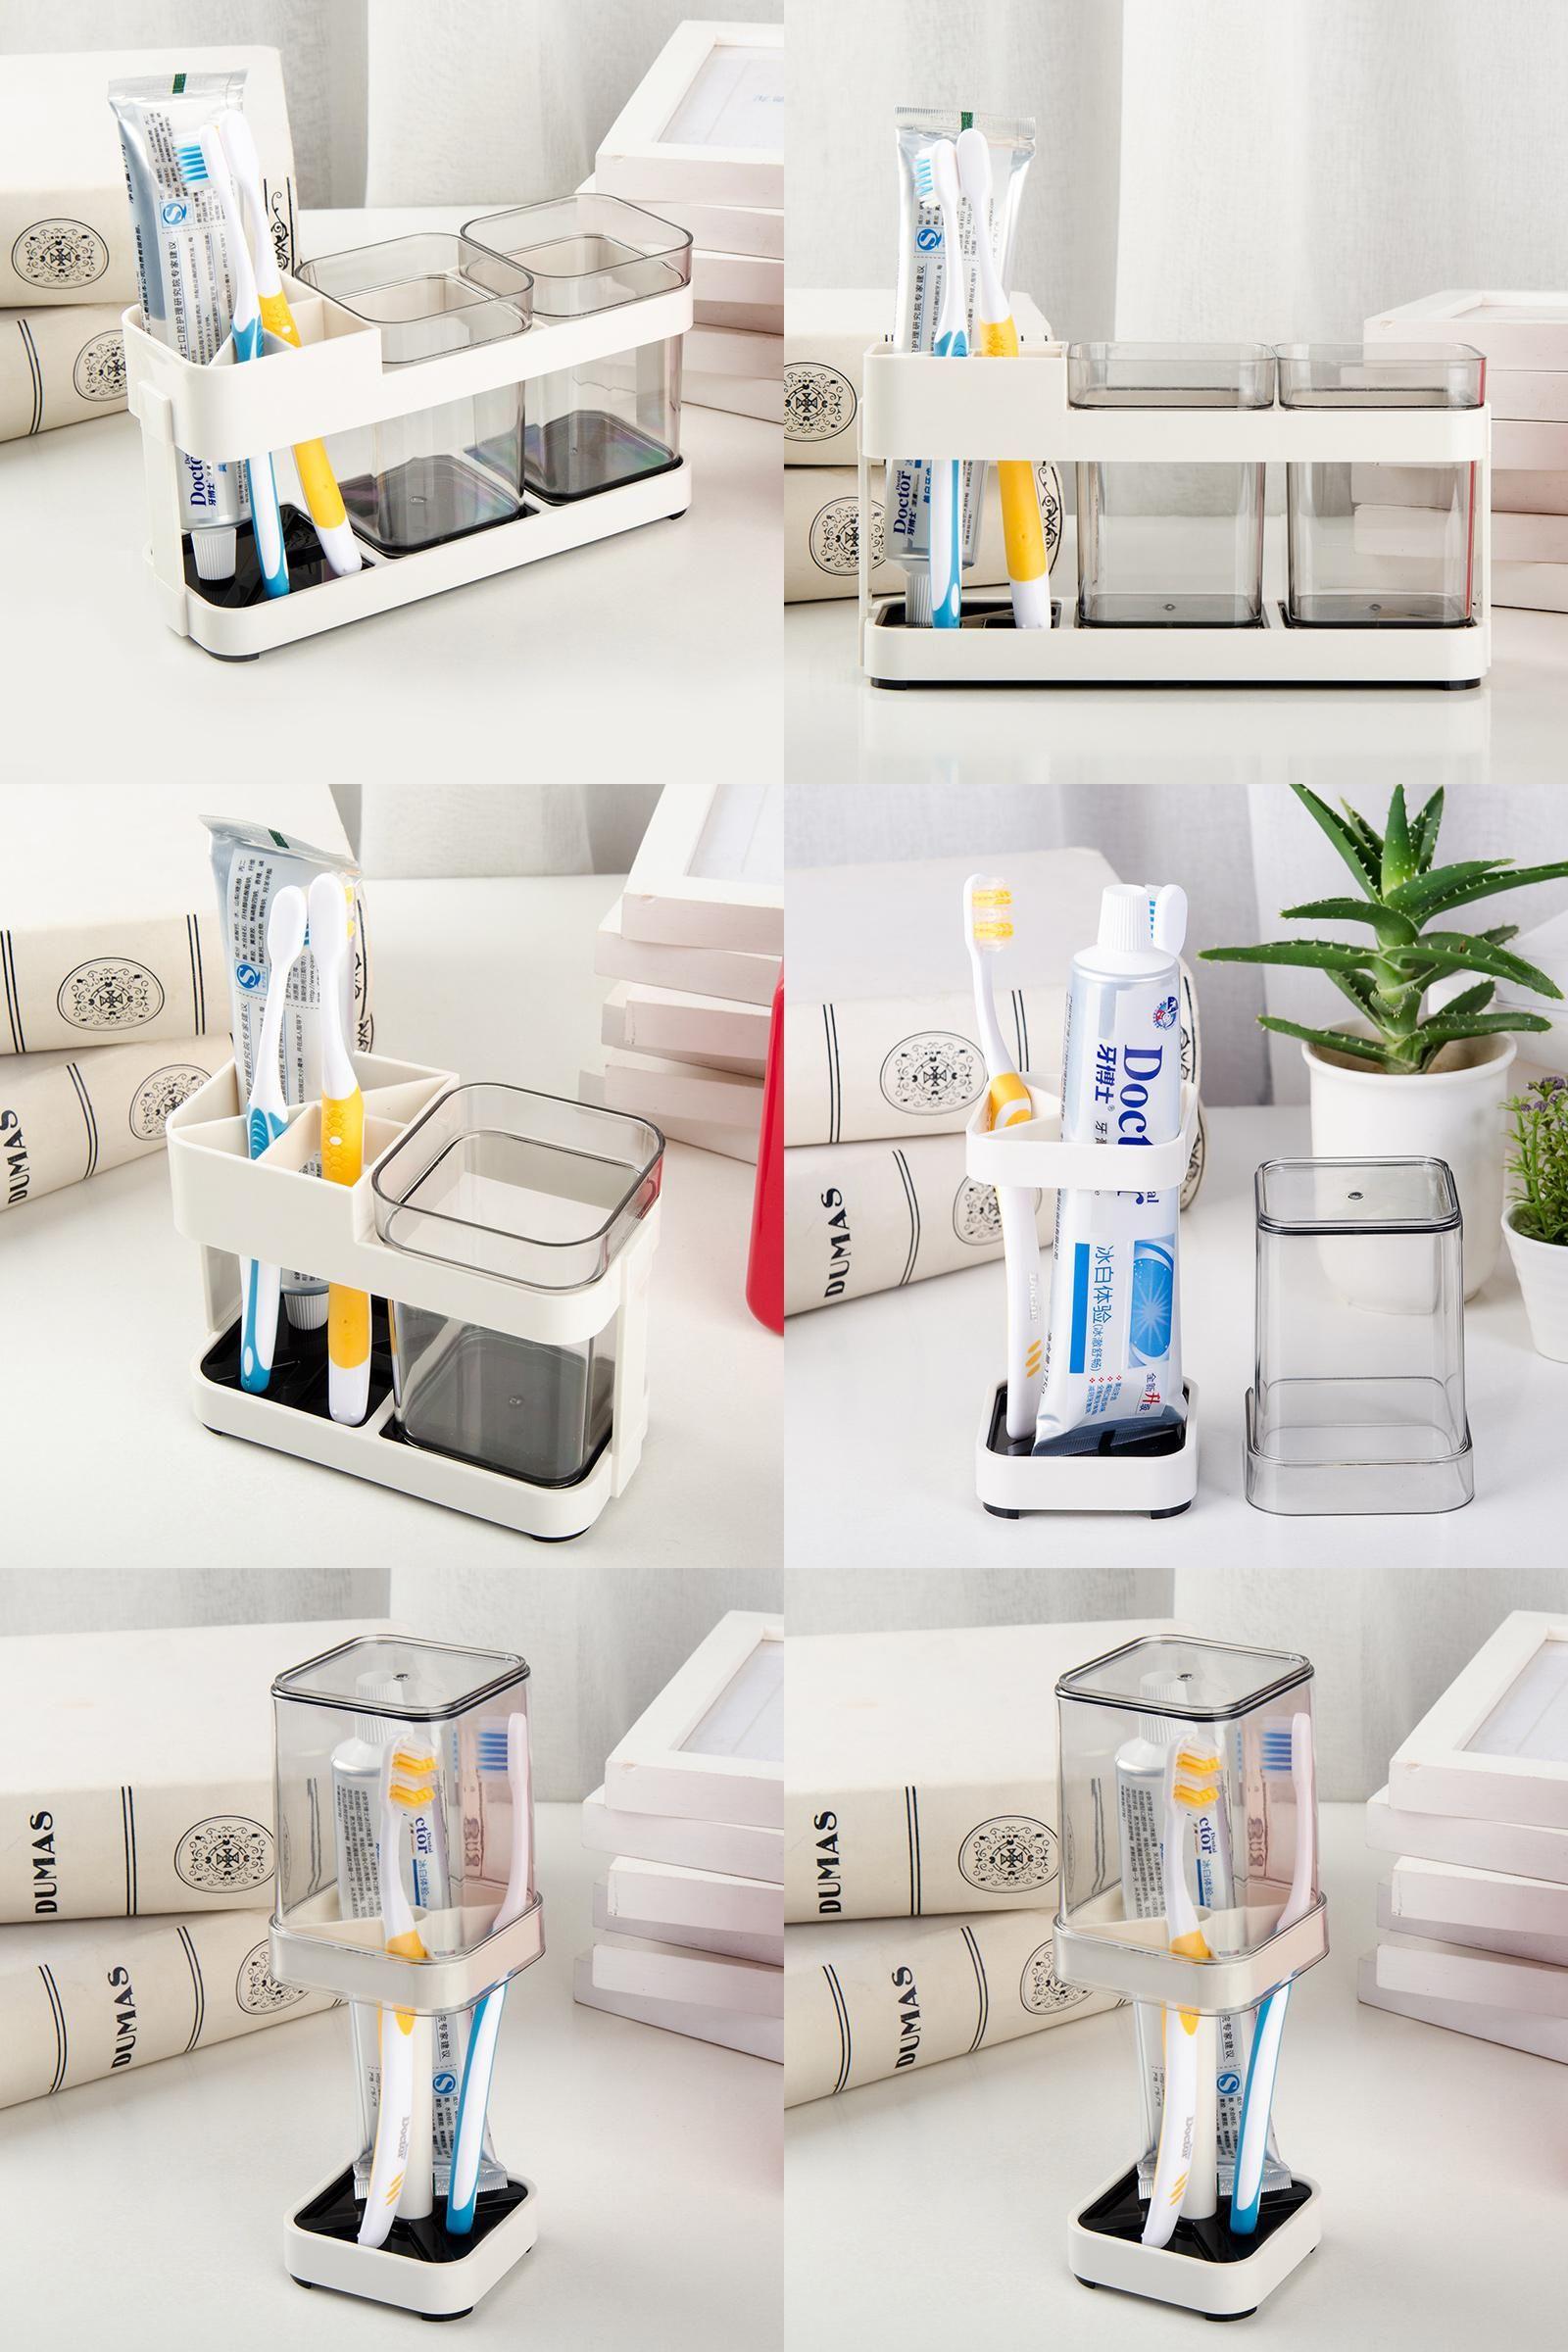 Visit To Buy Creative Bathroom Supplies Wash Set Toothpaste Tumbler Toothbrush Holder Plastic